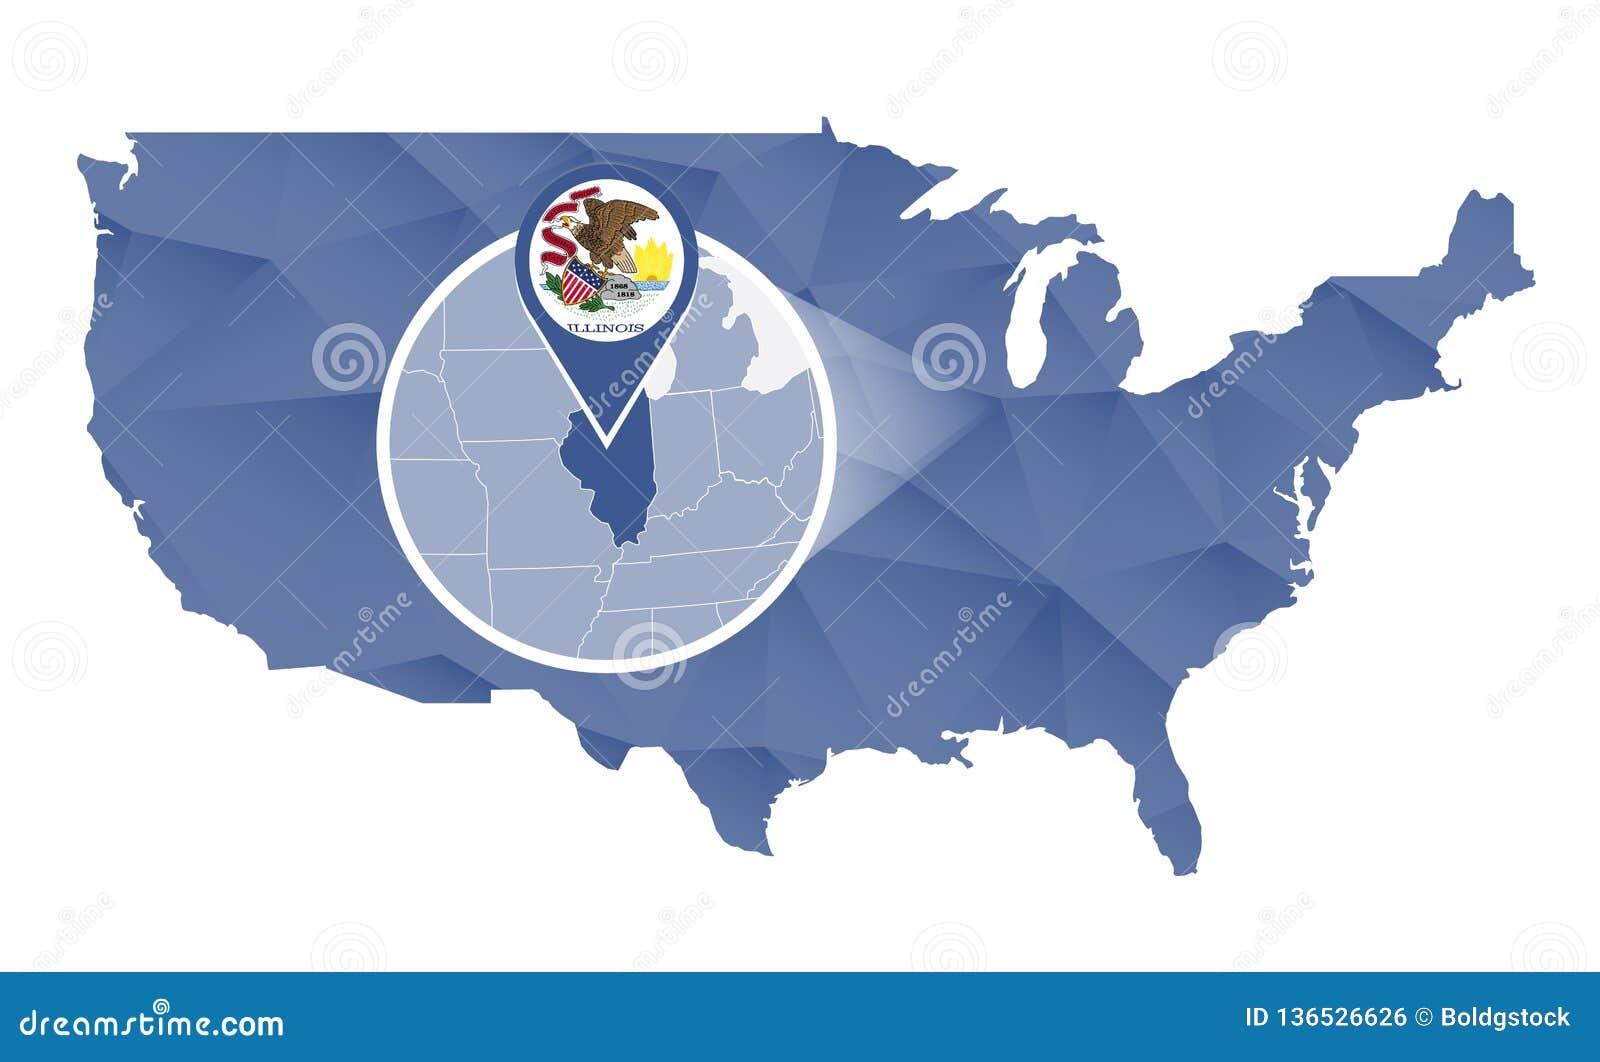 Illinois State Magnified On United States Map Stock Vector ... on illinois pennsylvania map, illinois map springfield il, illinois state parks map, illinois state map with cities and towns, illinois high speed rail map, illinois oregon map, illinois us map, illinois food map, illinois turkey map, illinois map and surrounding states, illinois street map, washington illinois map, illinois school district map, belleville illinois state map, illinois tribe map, illinois concealed carry map, illinois judiciary map, illinois state university map, illinois minnesota map, illinois zip codes by city map,